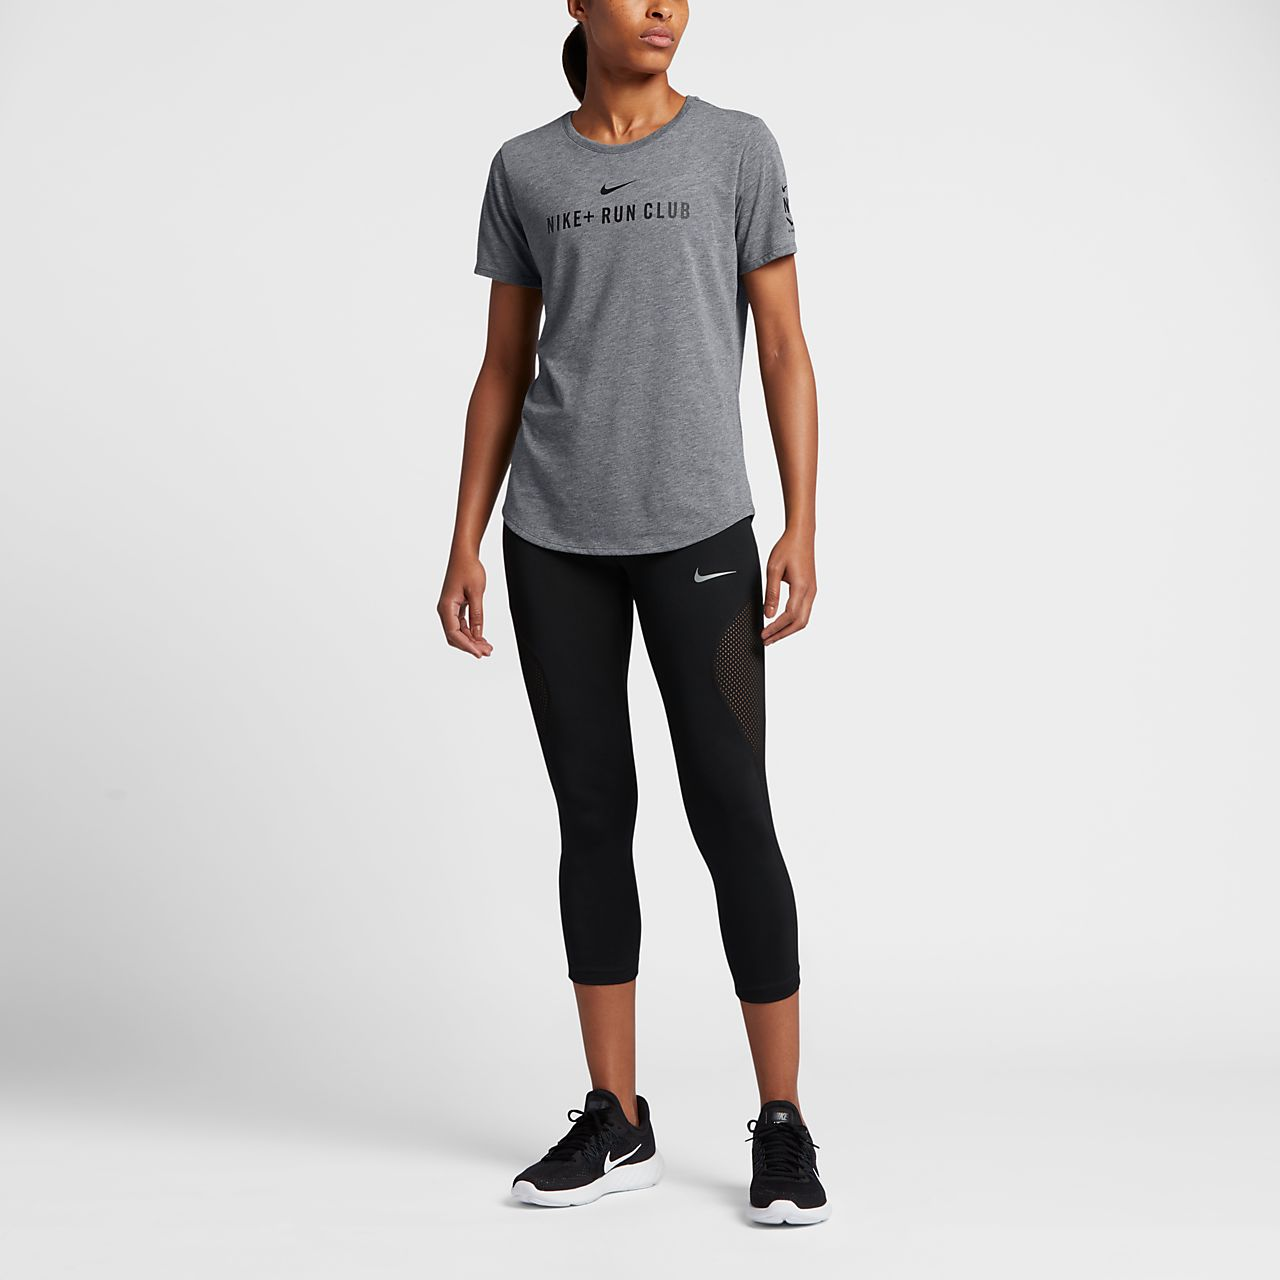 ... Nike Dri-FIT Run Club Women's T-Shirt